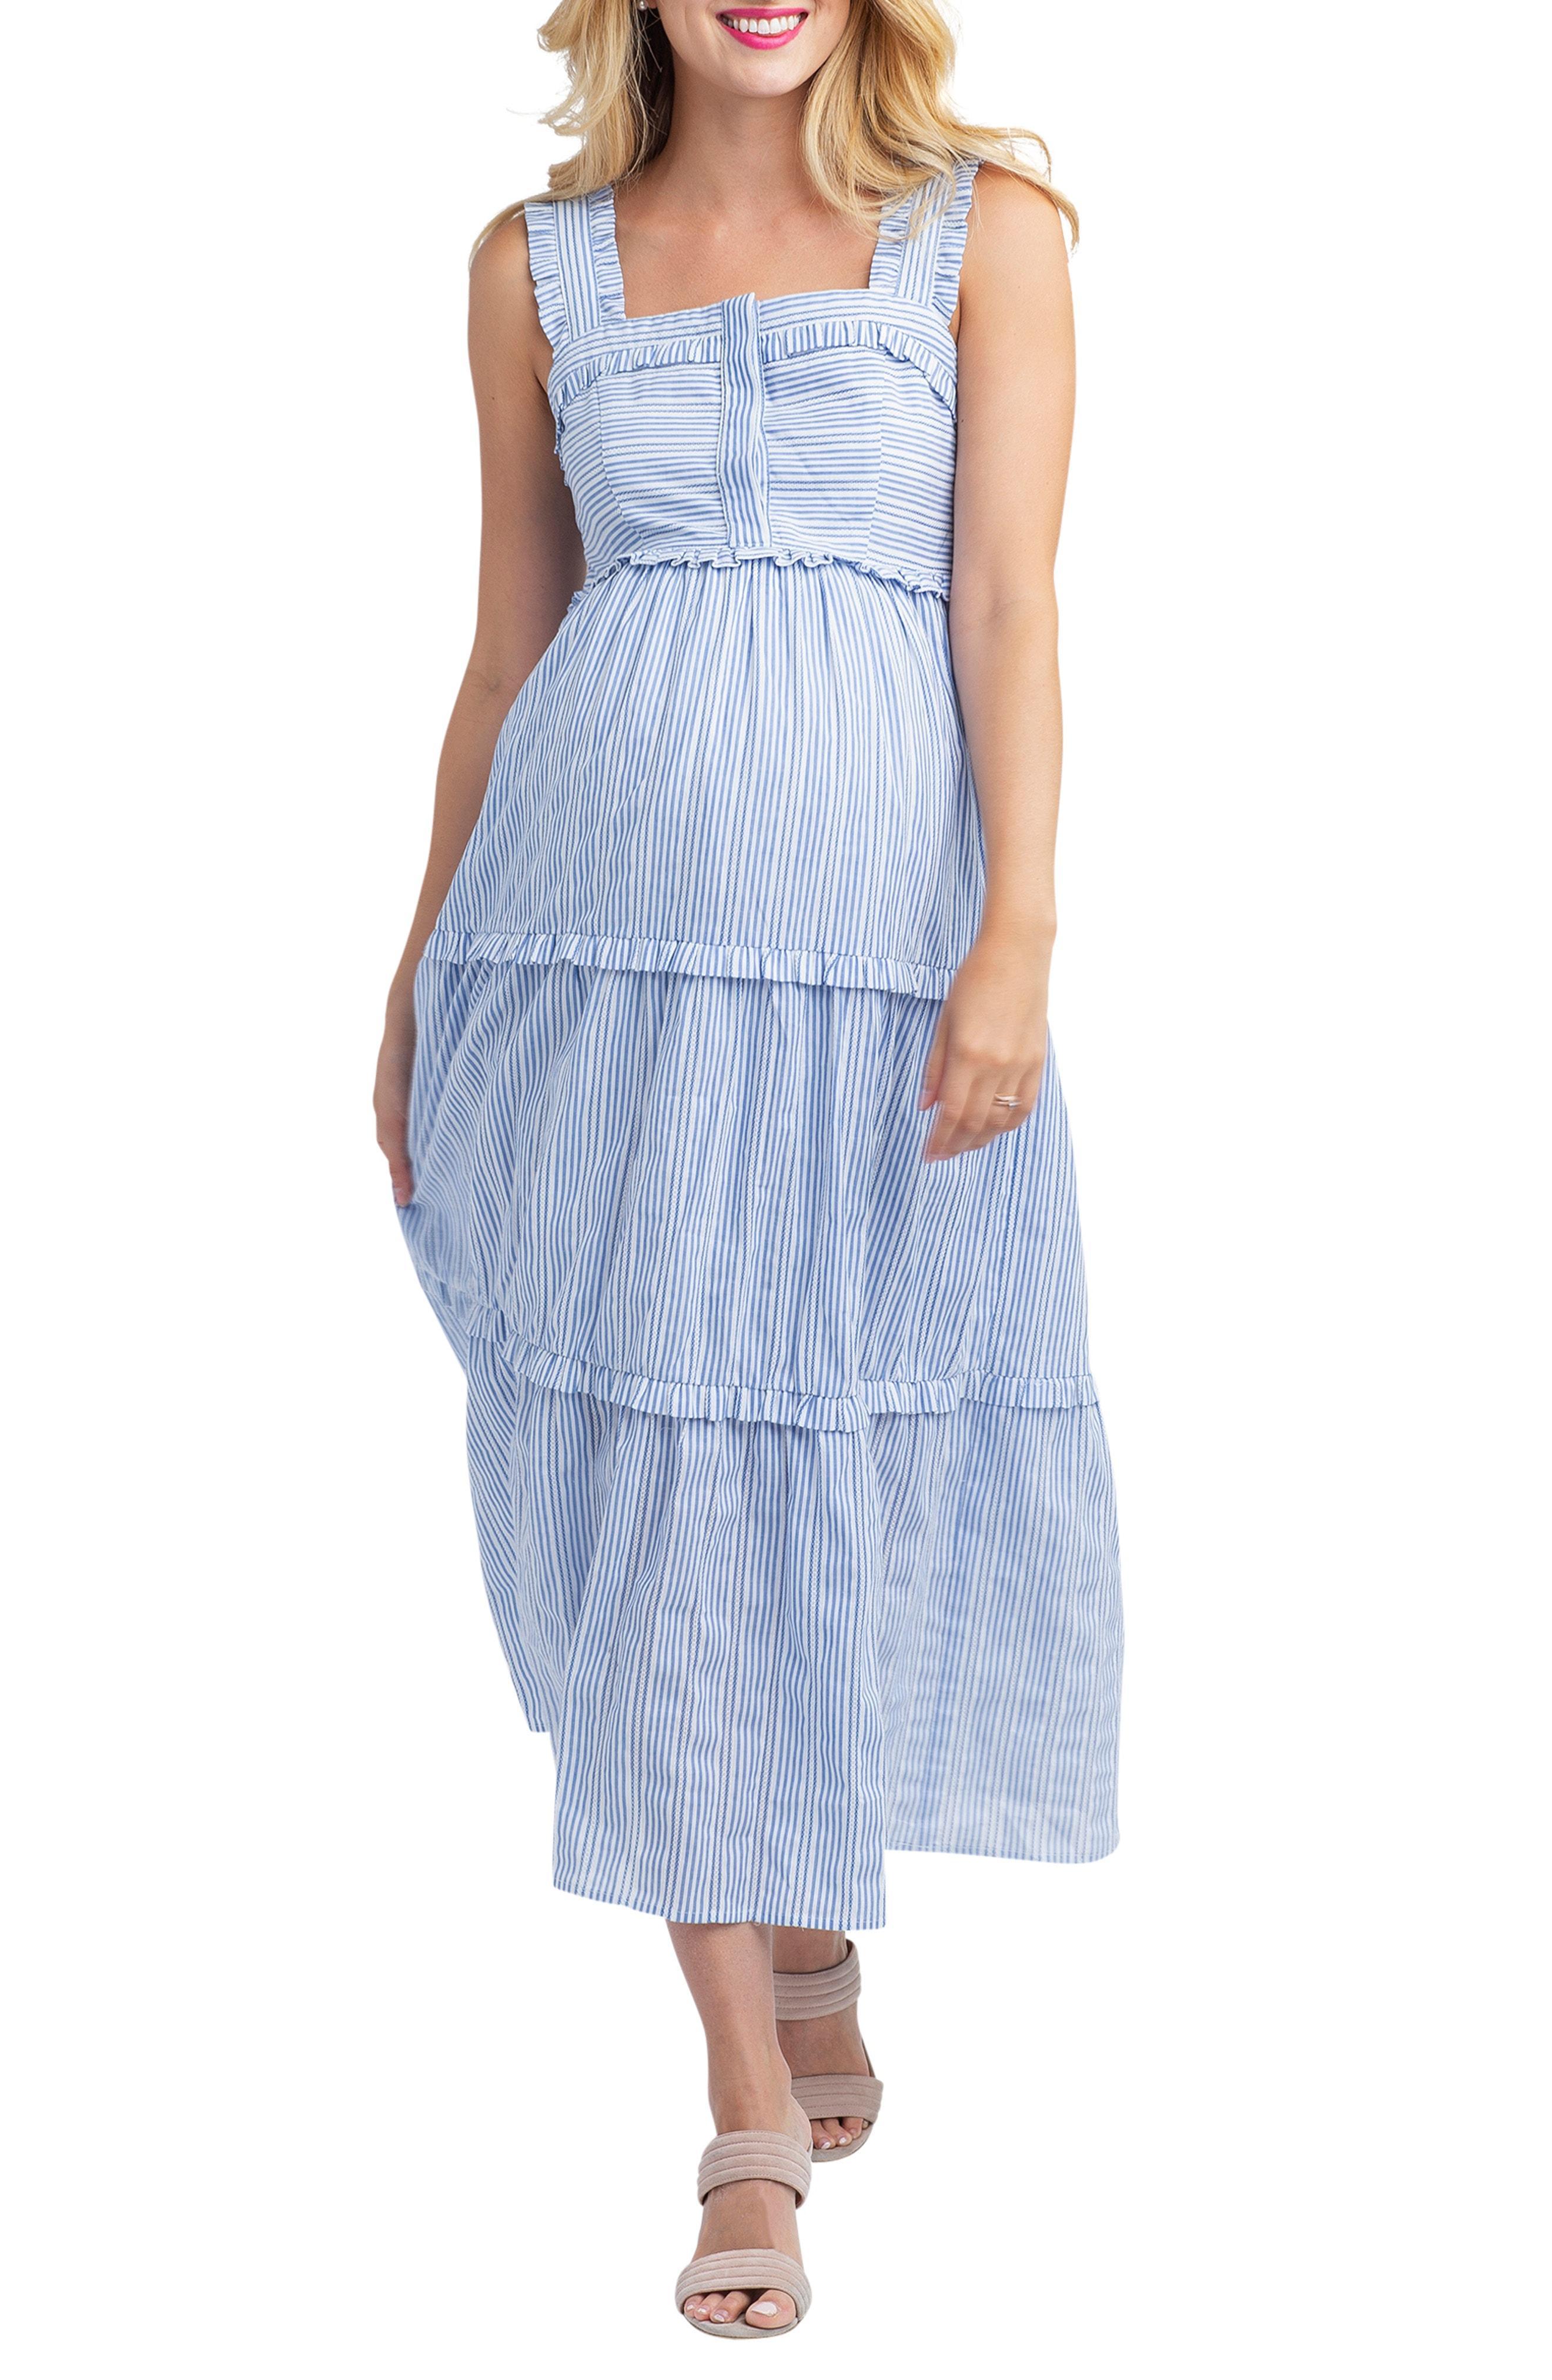 b1ae6bb5178 Lyst - Nom Maternity Emma Maternity nursing Midi Dress in Blue